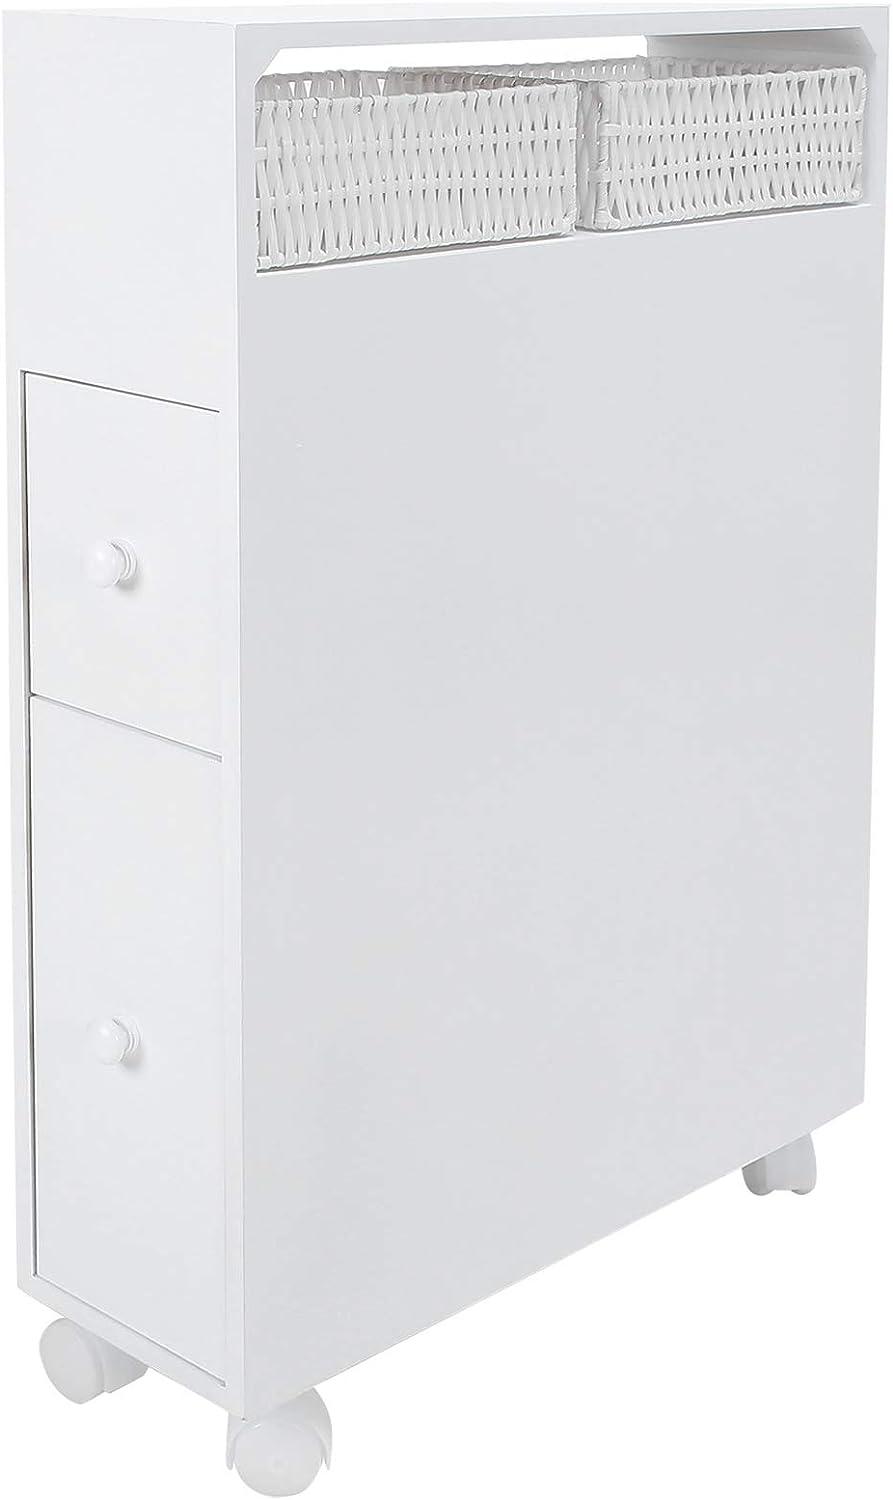 Kadimendium Four Casters Charlotte Mall Toilet Locker Cabinet Bathroom Pa half Nylon